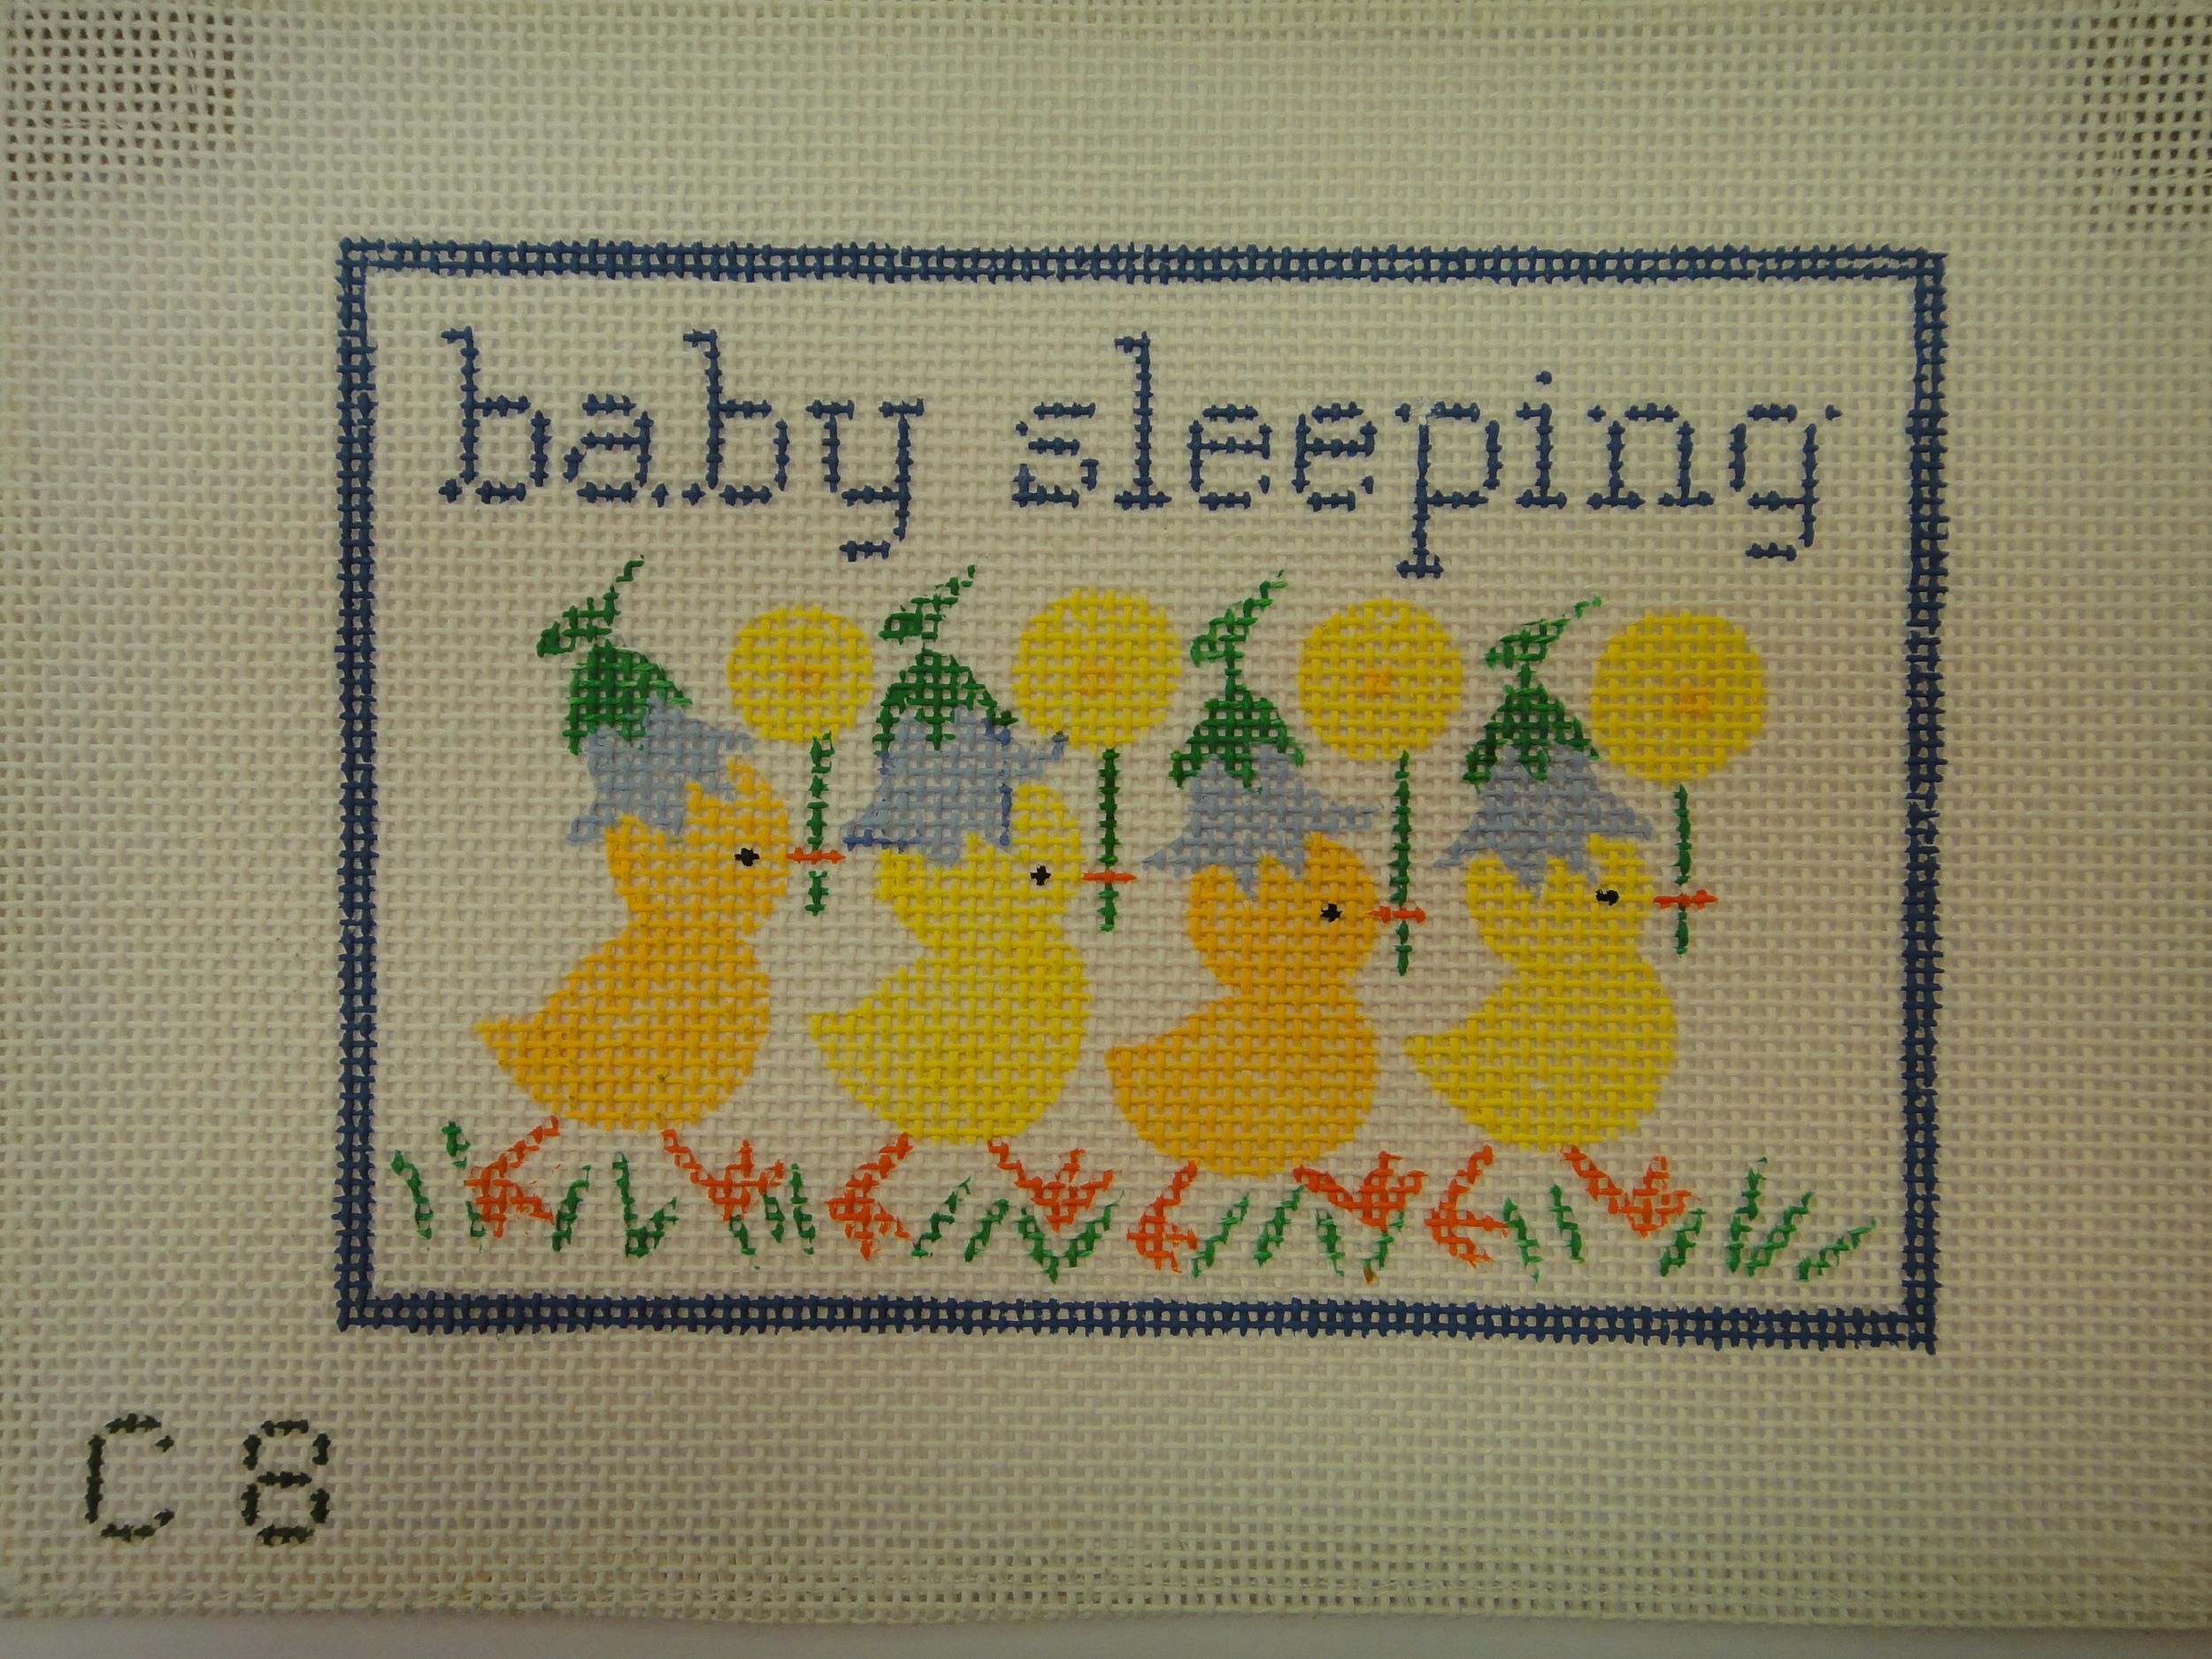 S21A Baby Sleeping with Ducks, Blue (7x5)